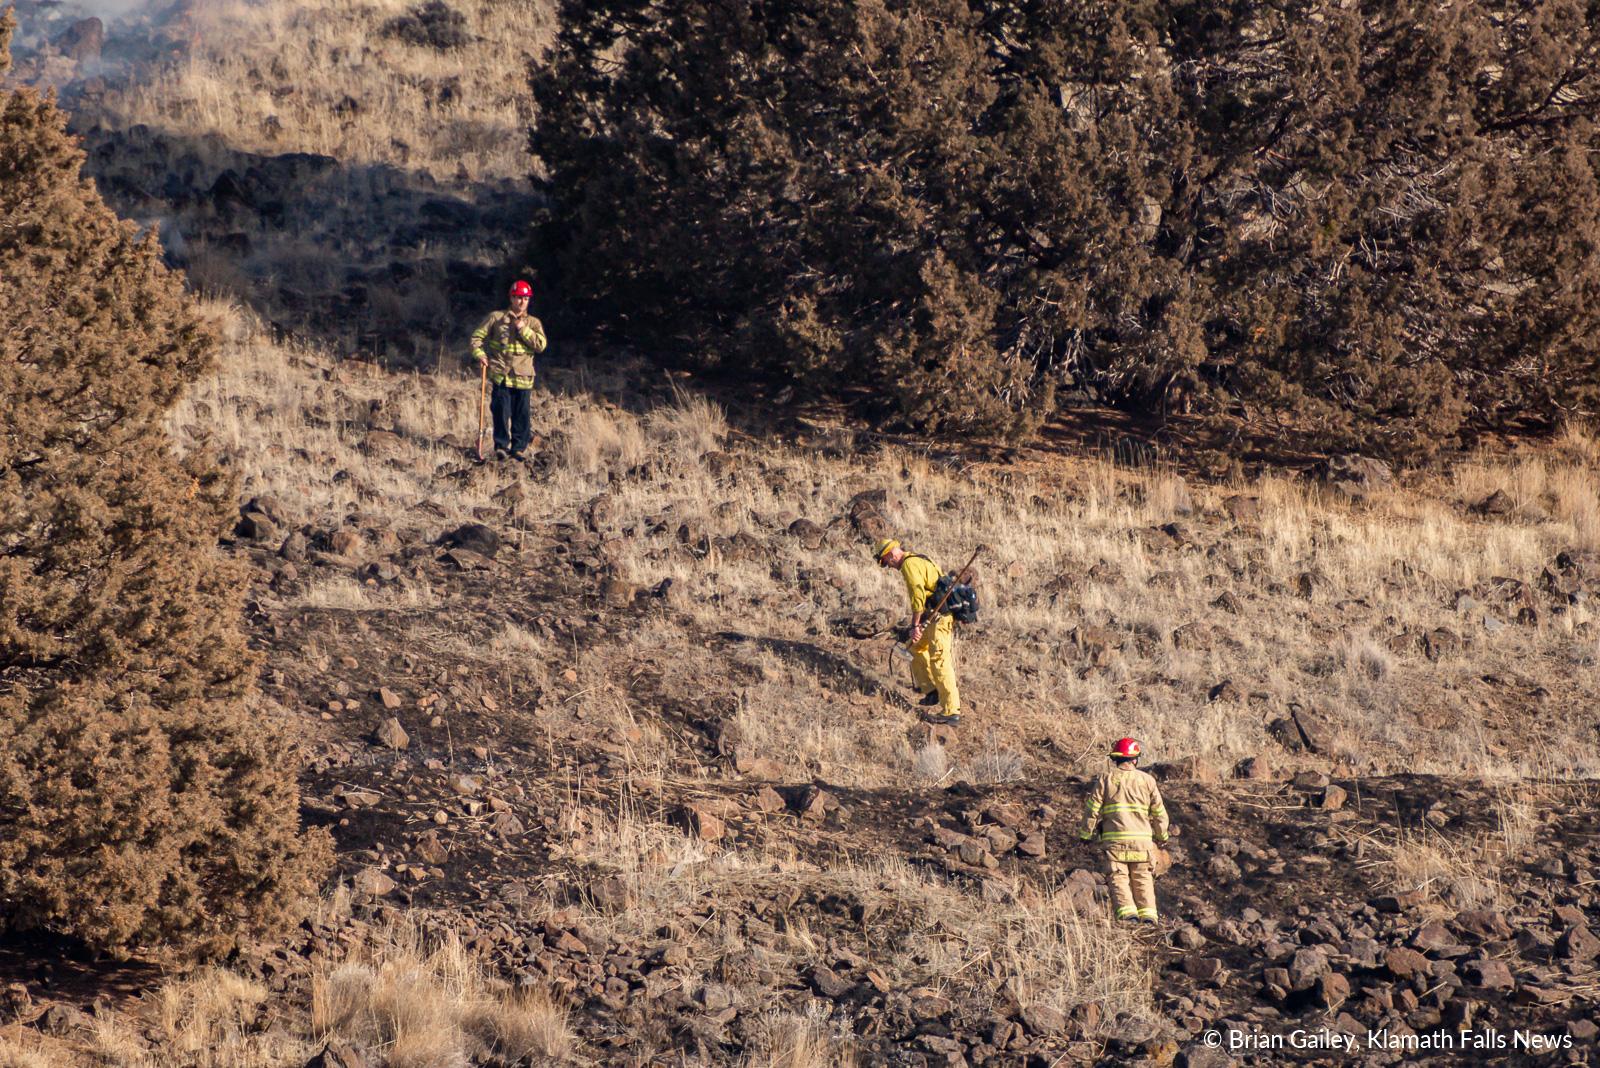 A suspicious fire burns on Stukel Mountain near Chalet Drive in Klamath Falls. January 14, 2019 (Brian Gailey)